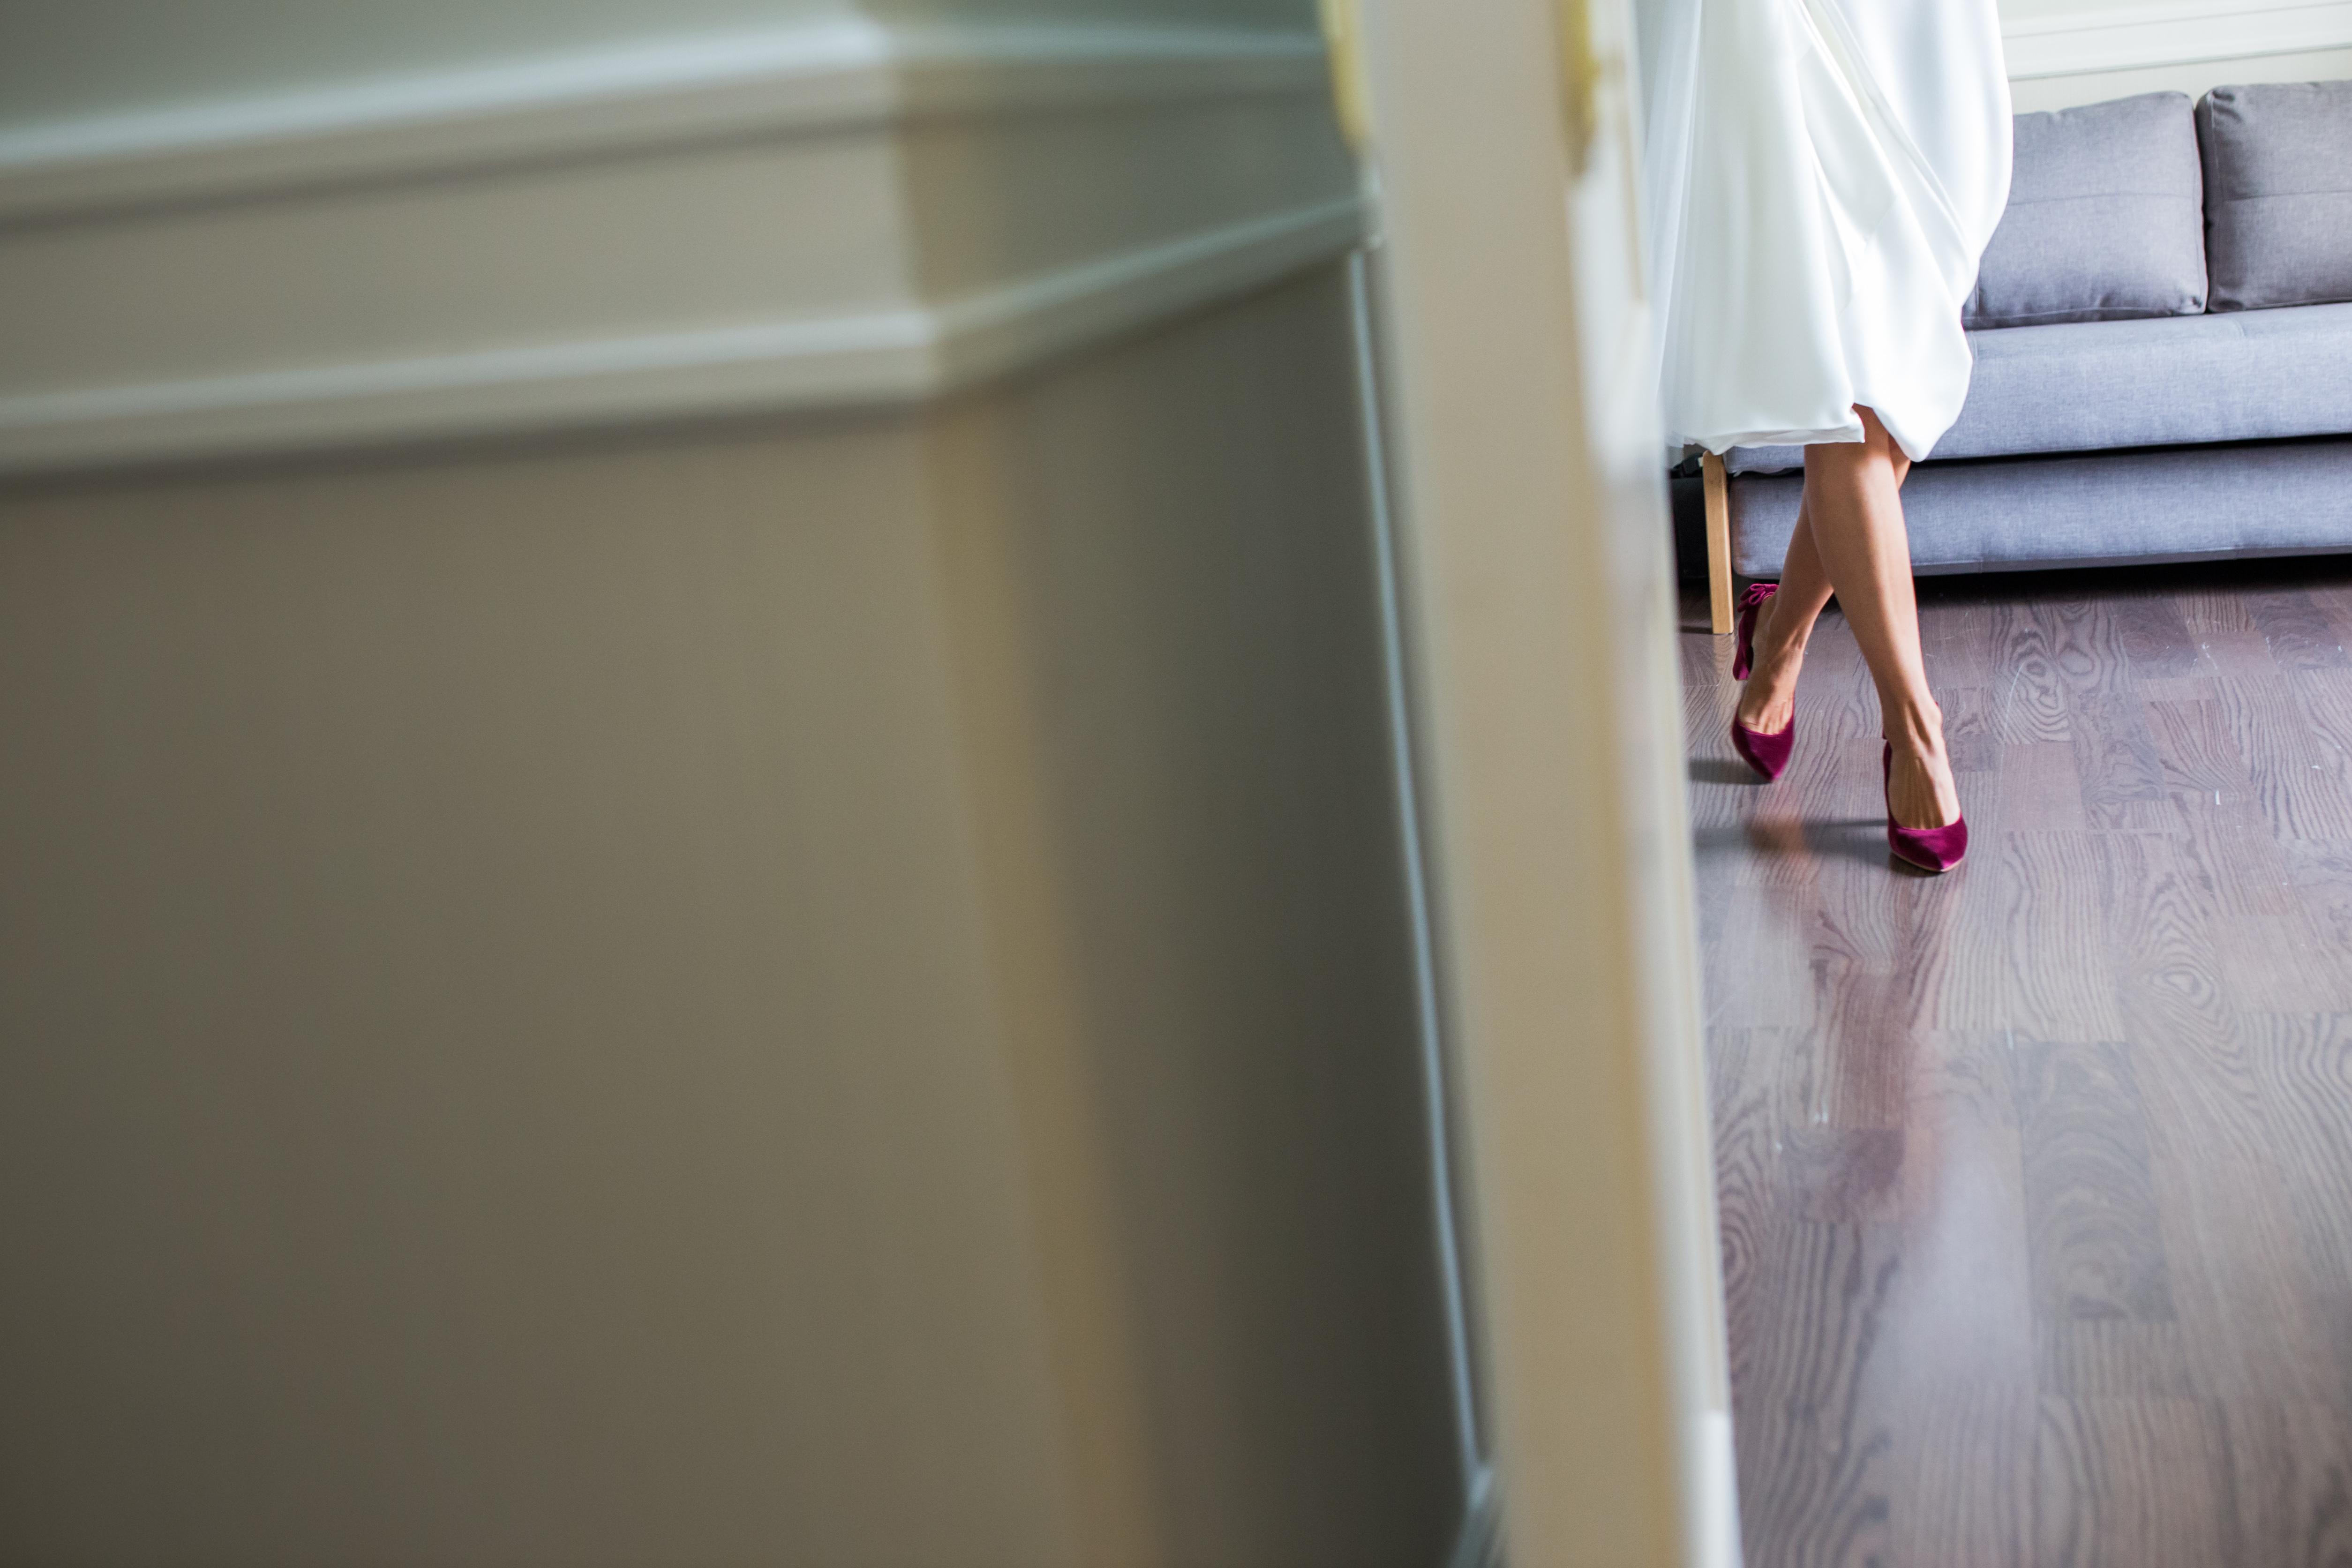 mandarina weddig, fotografos de boda, fotografo boda soria, fotografo boda barcelona, fotografo boda Madrid, fotografo boda lerida, fotografo boda Huesca_03